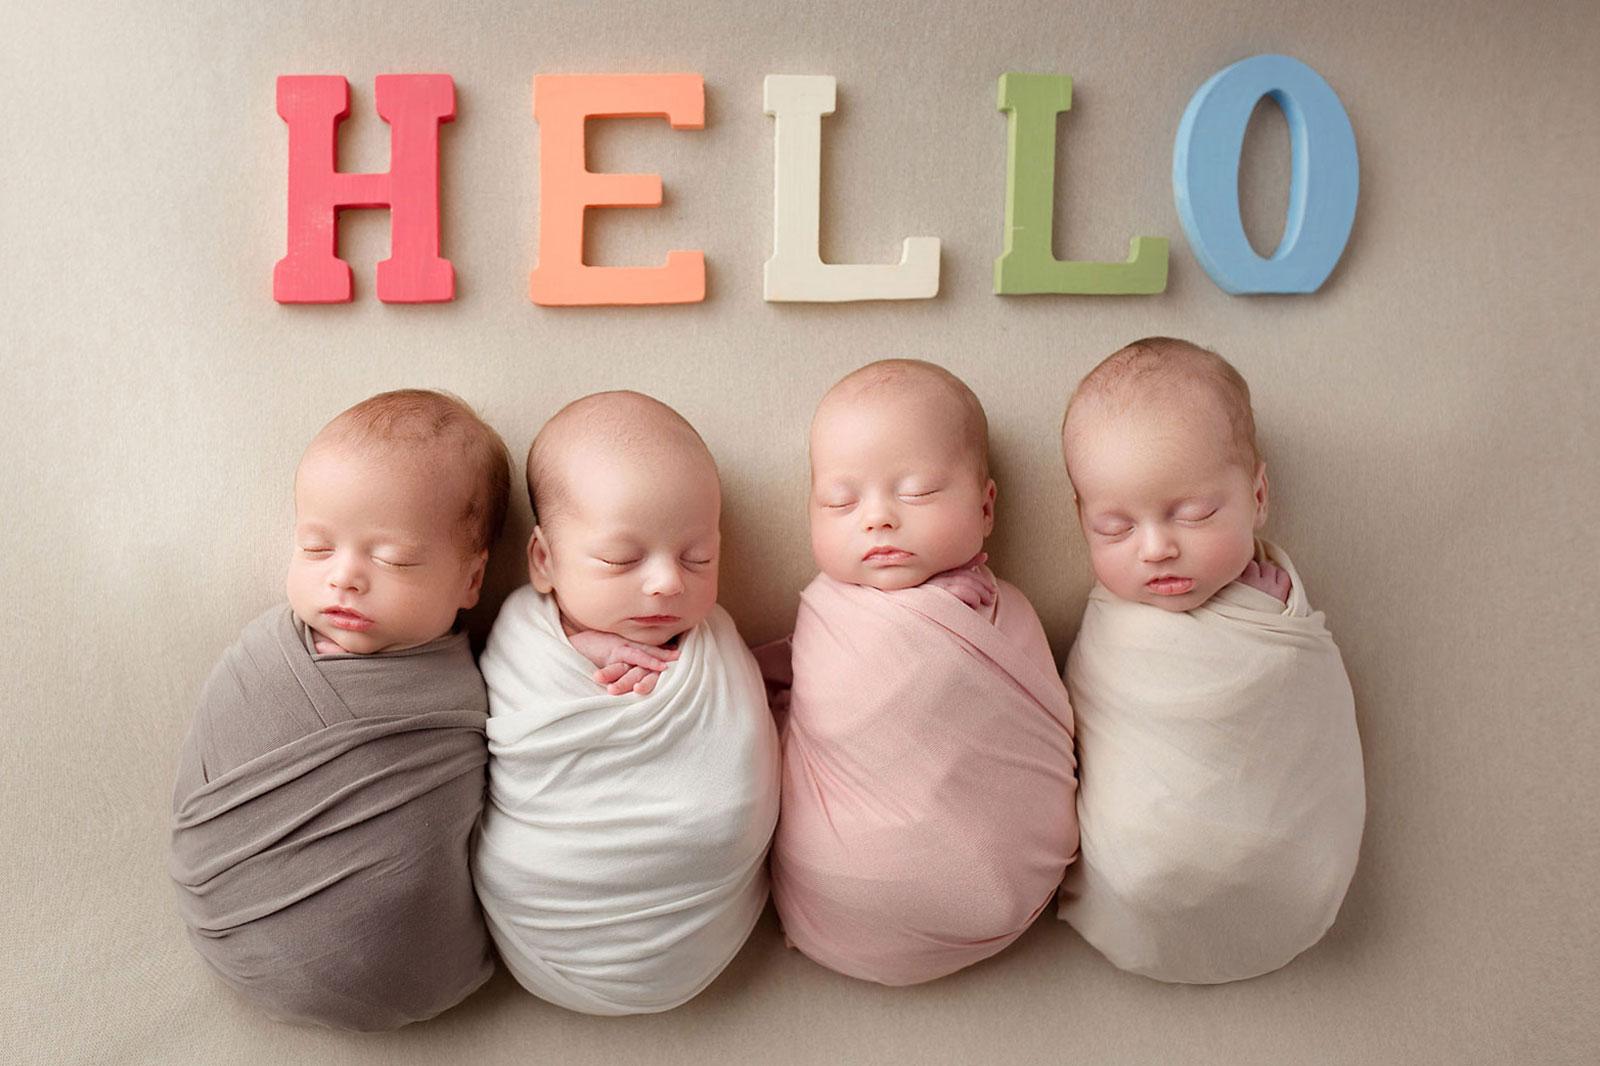 Pictures of quad rainbow babies